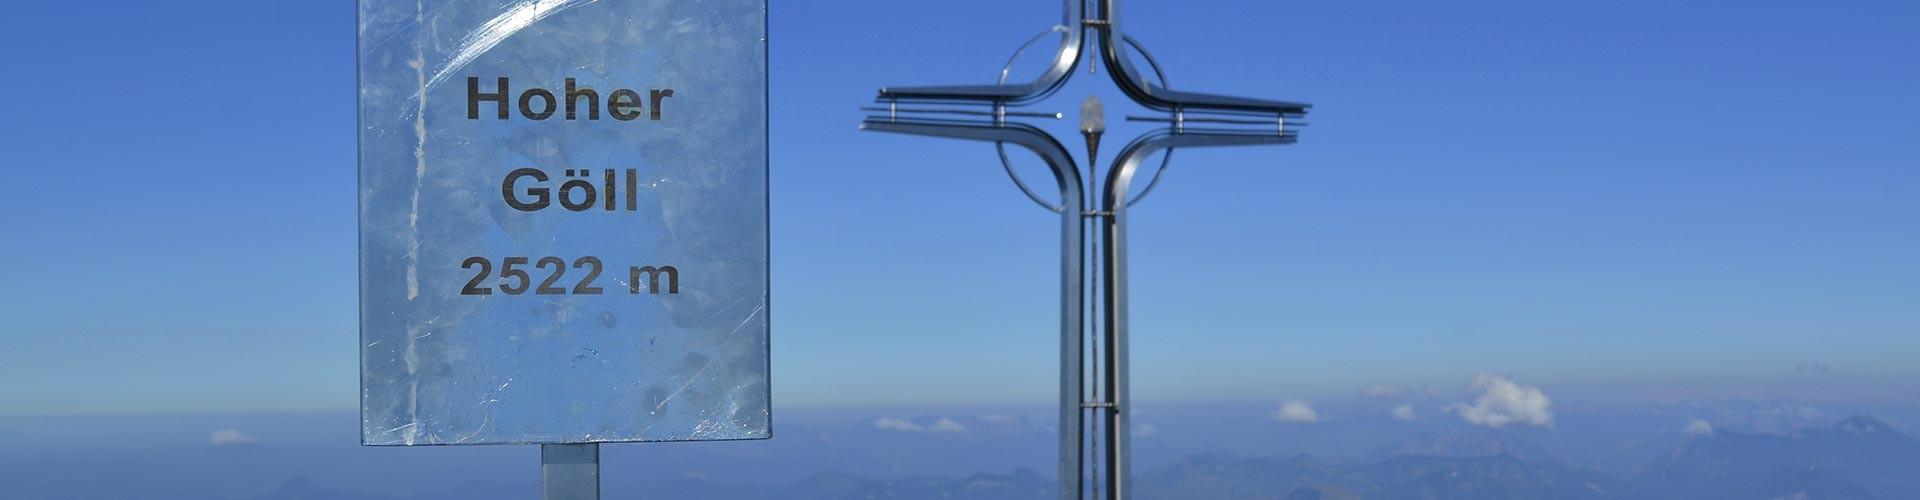 Bergsteigen im Berchtesgadener Land